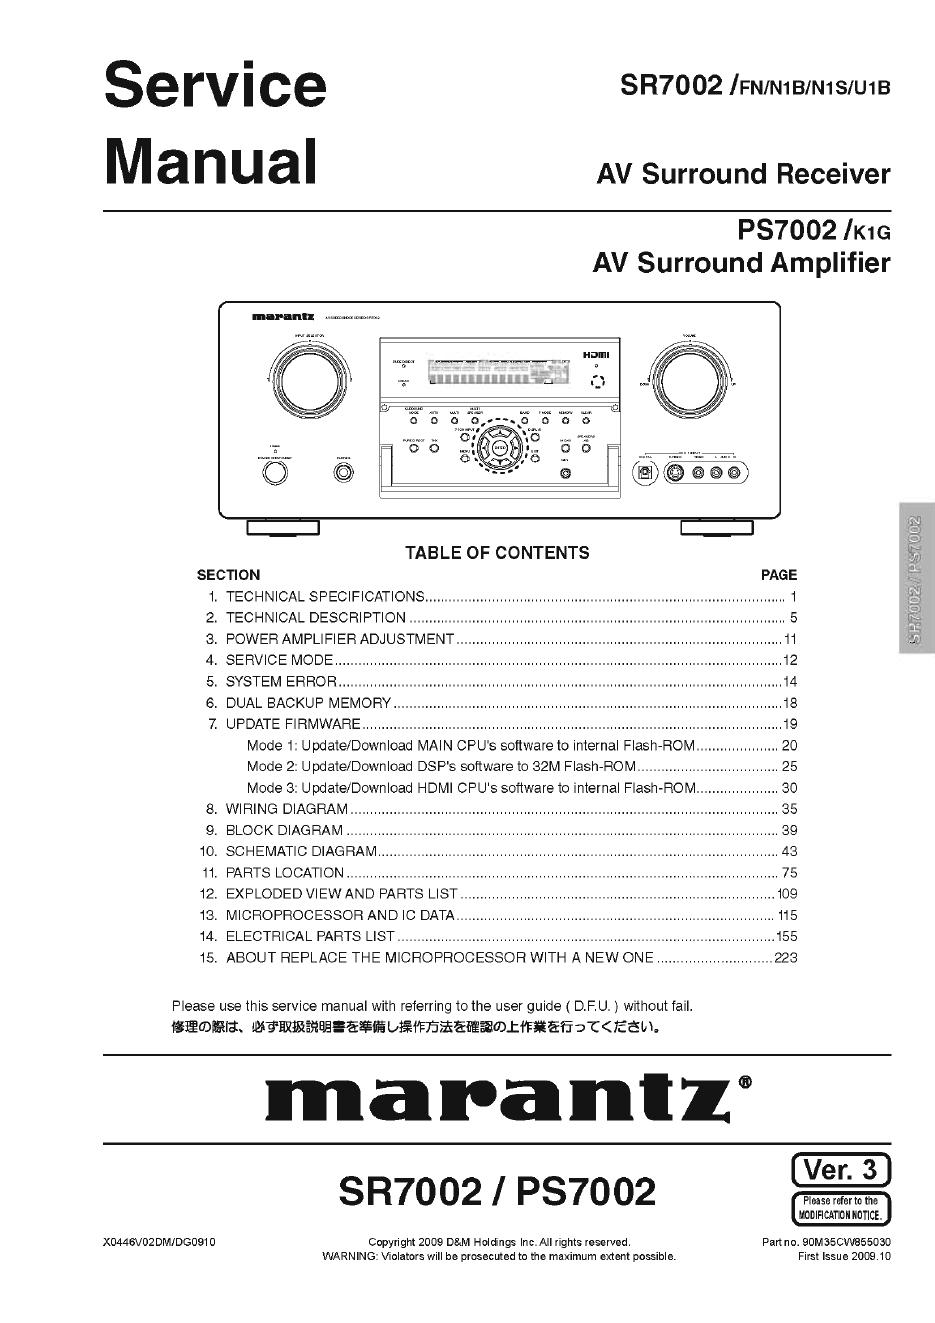 Marantz马兰士 SR7002功放维修手册